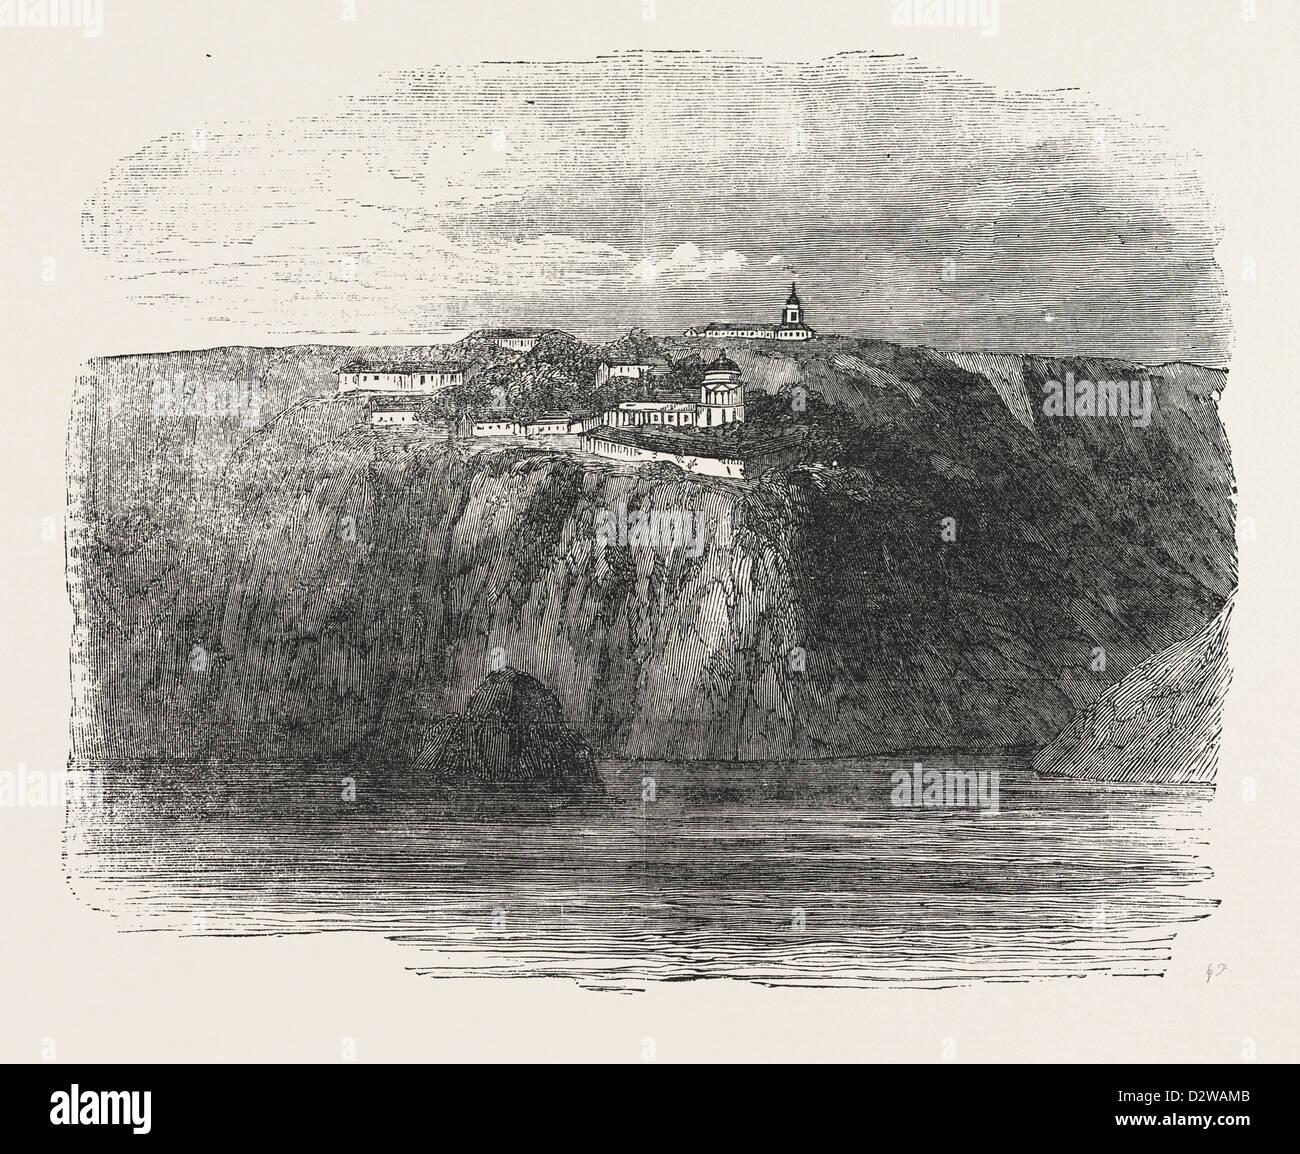 MONASTERY OF ST. GEORGE NEAR BALACLAVA 1854 - Stock Image